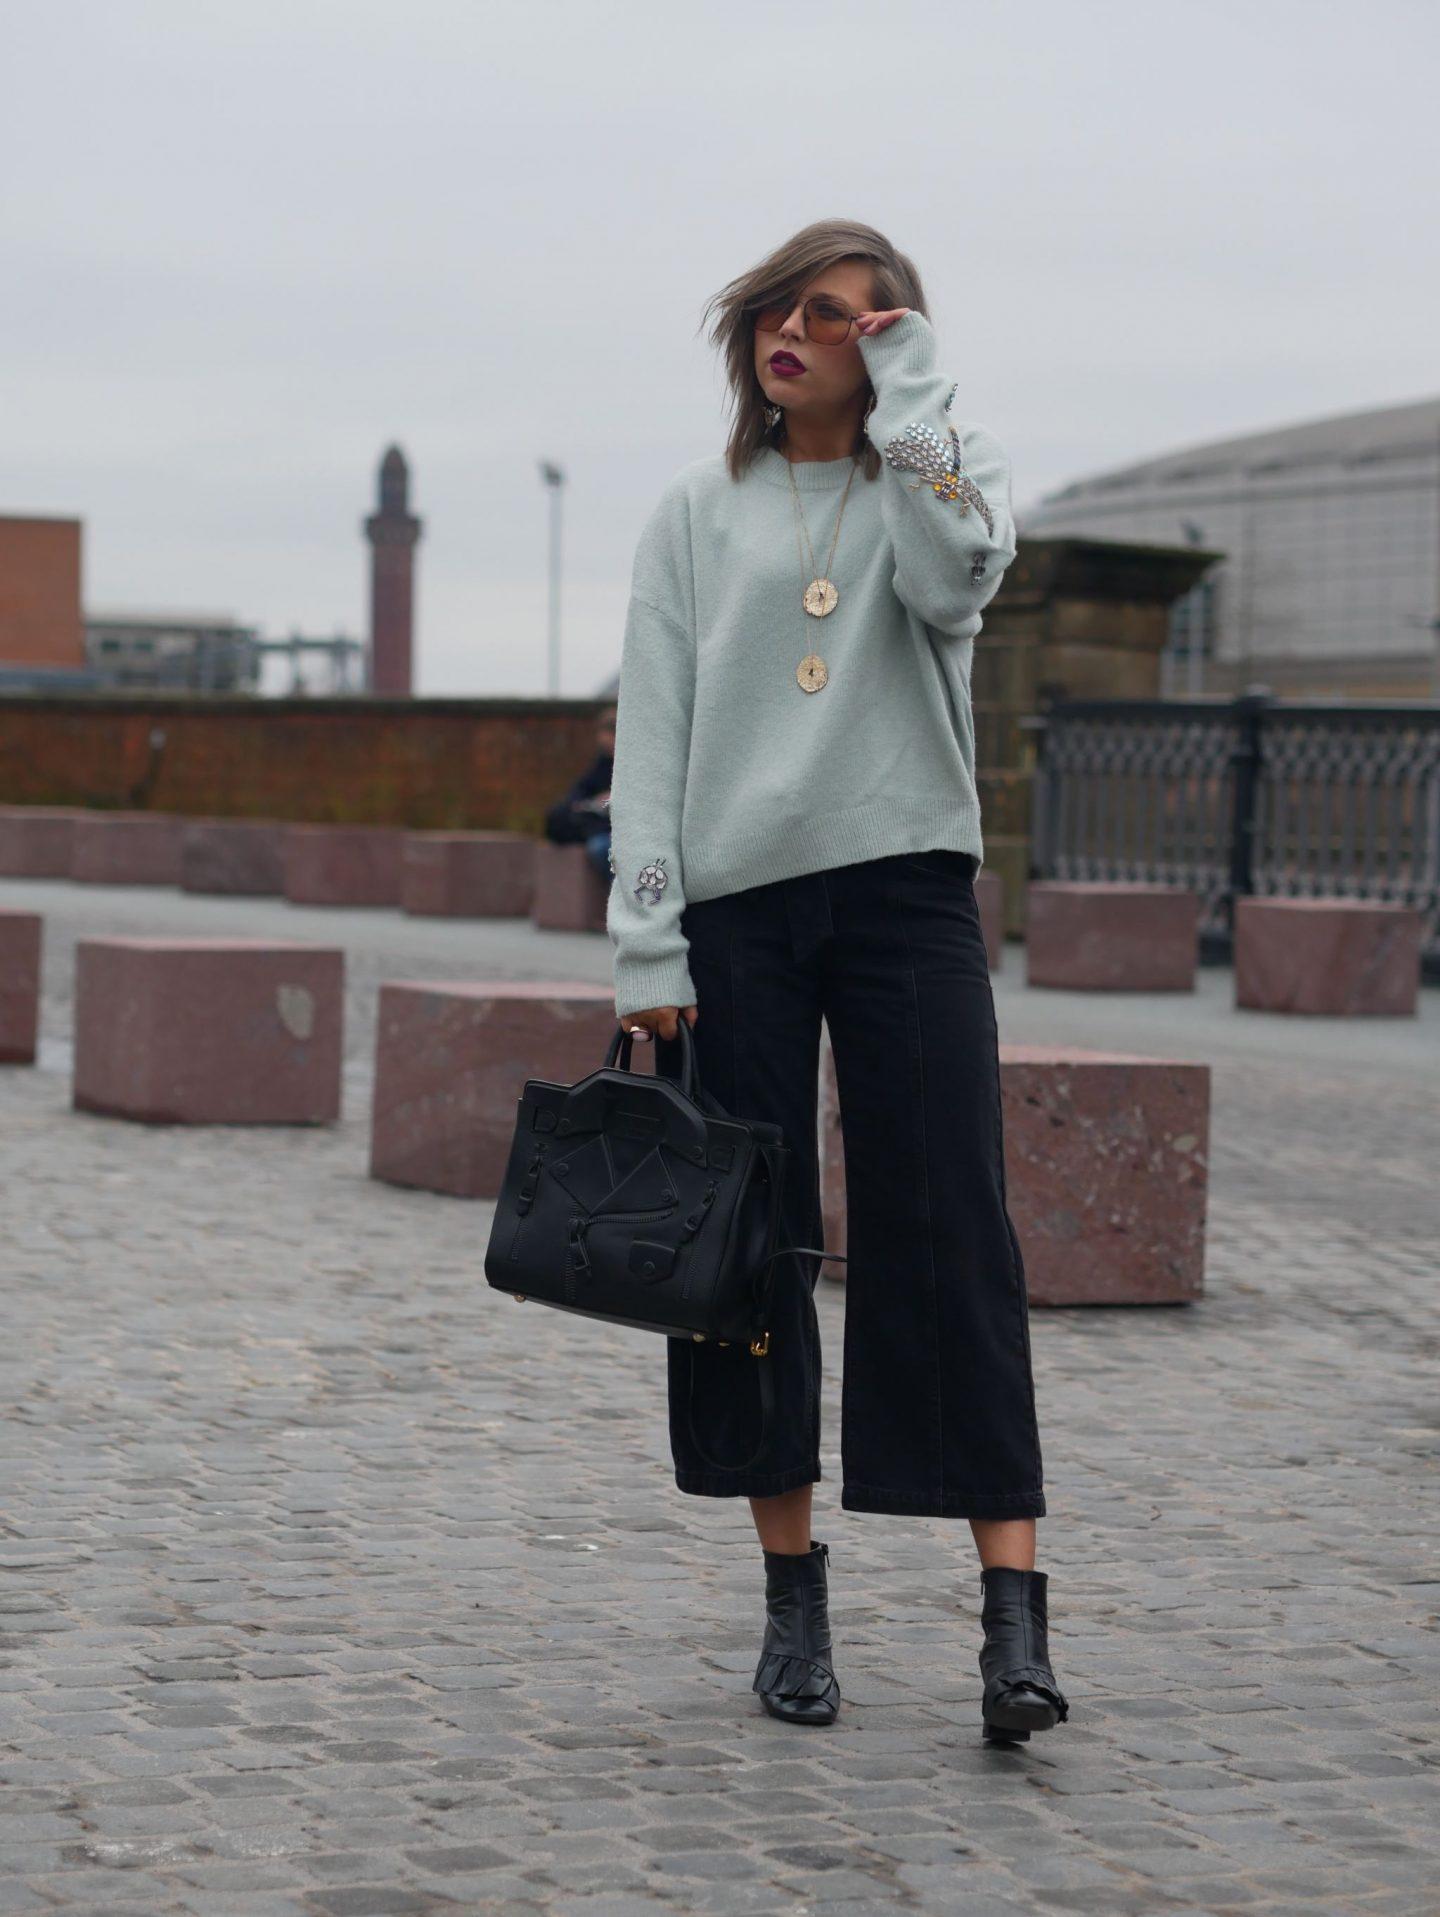 manchester fashion blogger, manchester bloggers